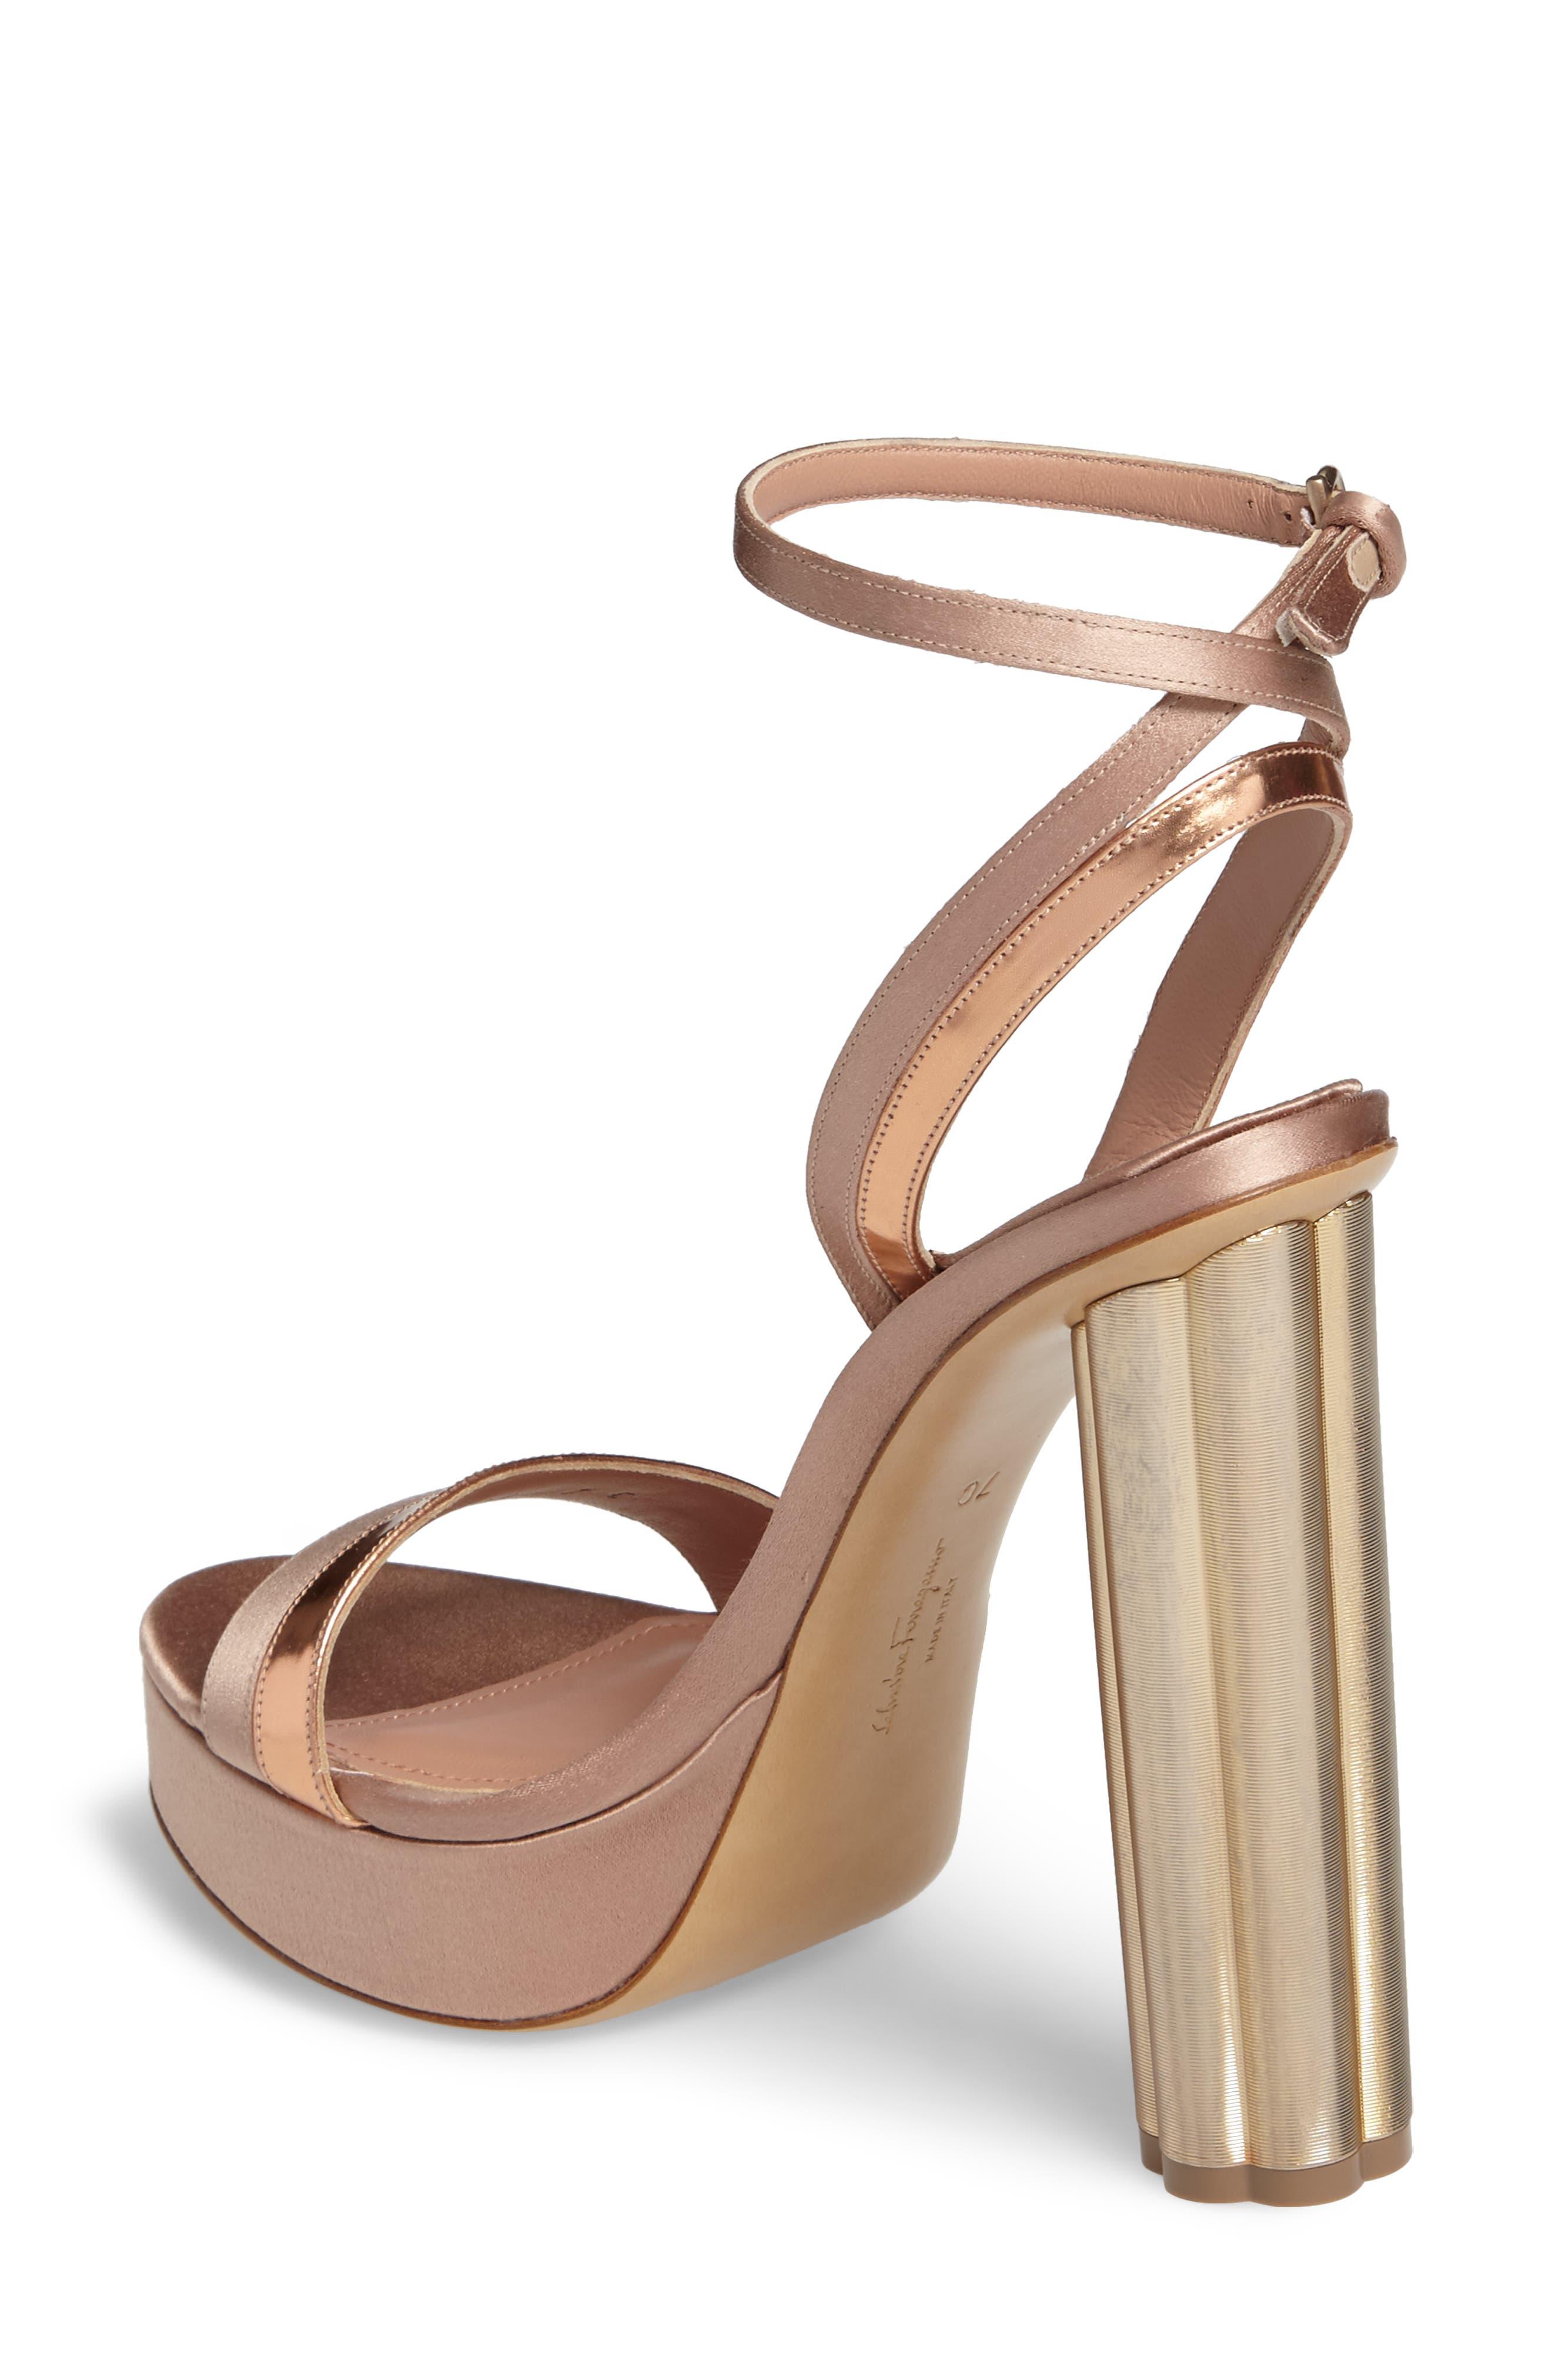 Ankle Strap Platform Sandal,                             Alternate thumbnail 2, color,                             710